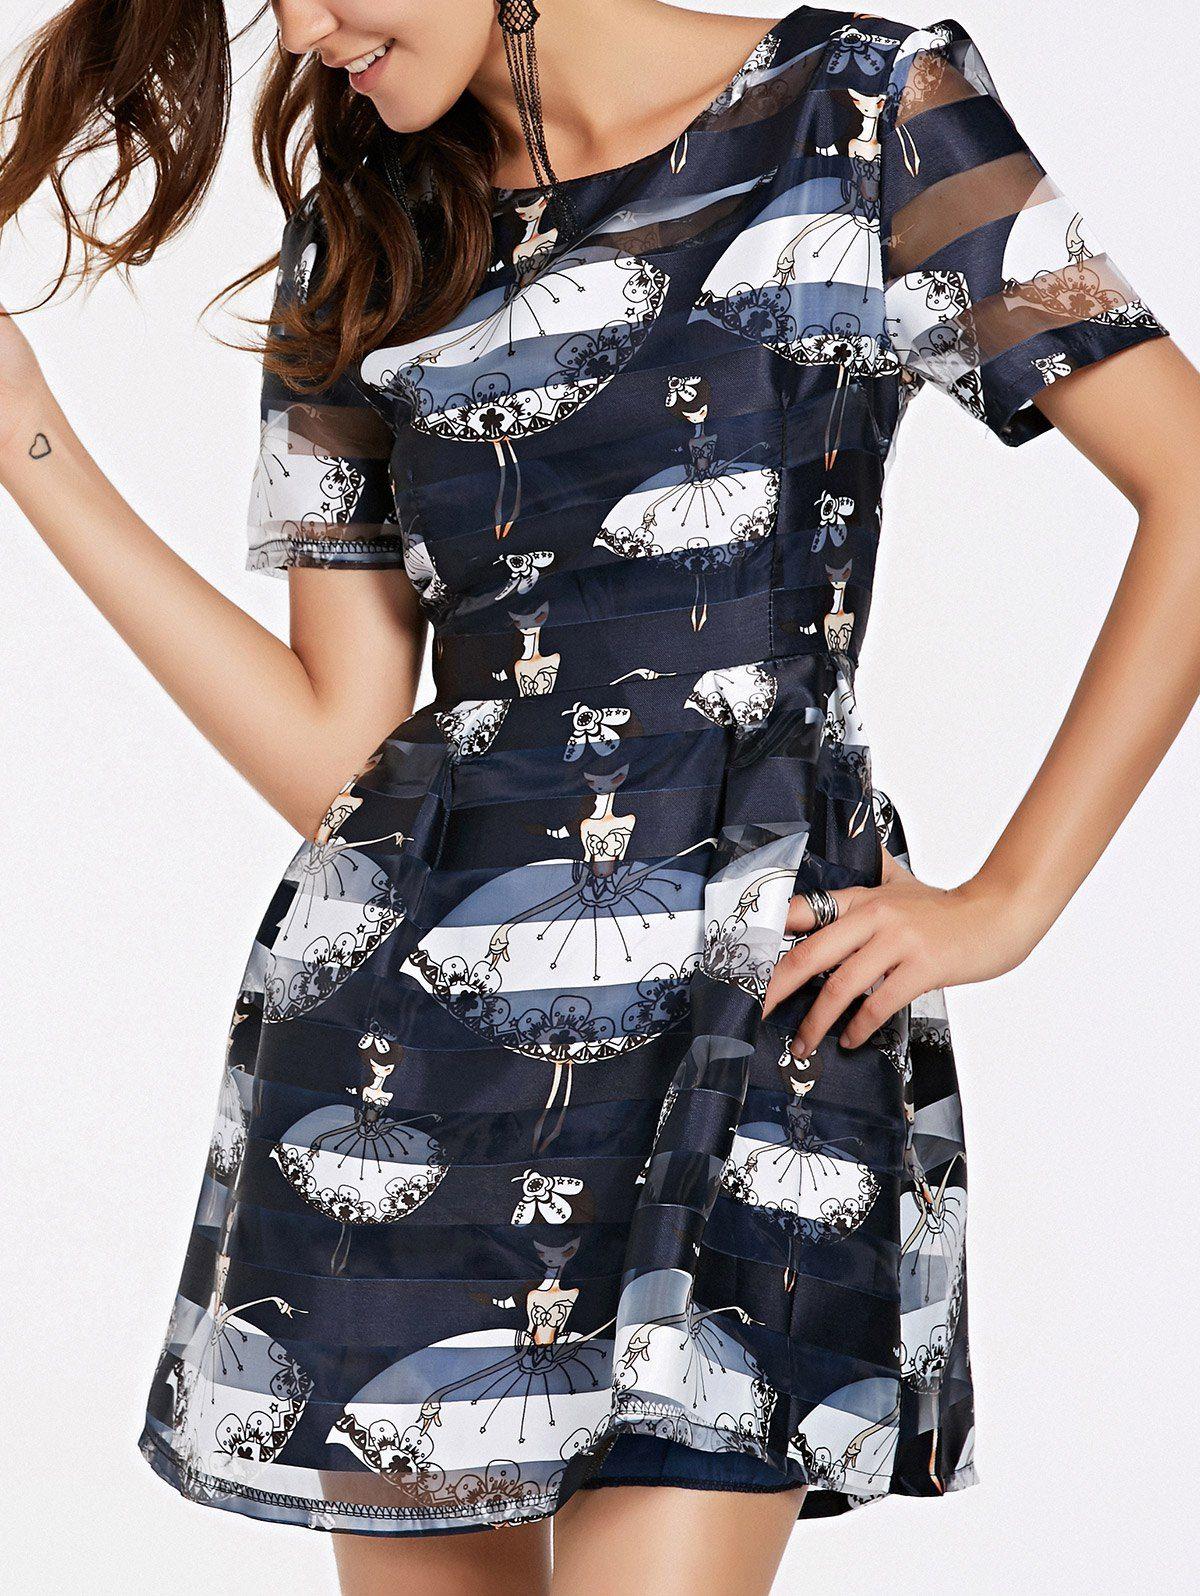 Elegant Girl Pattern Jewel Neck See Through Printed Dress For Women